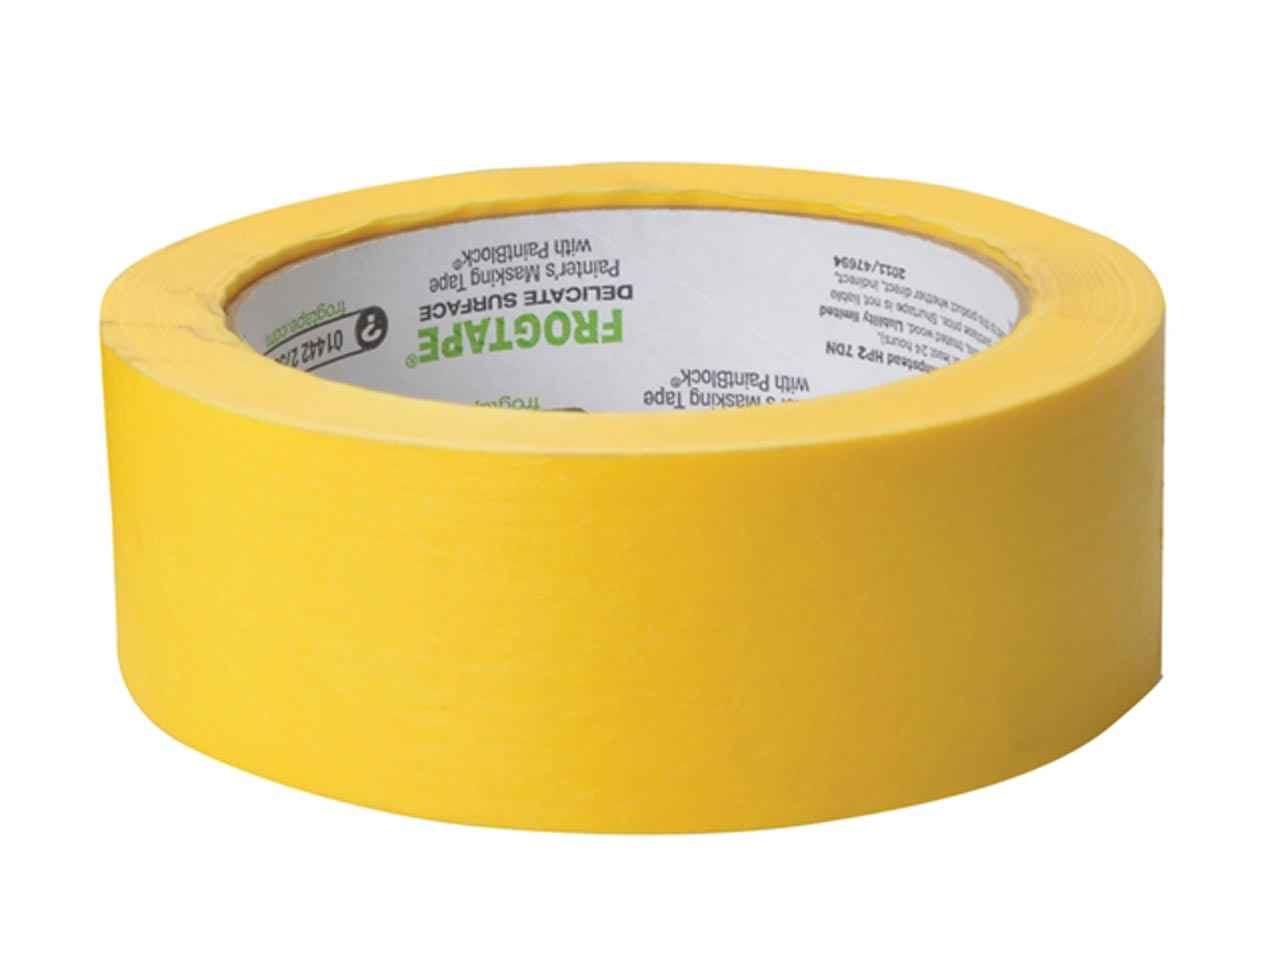 frogtape 202552 24mm x 41.1m delicate masking tape